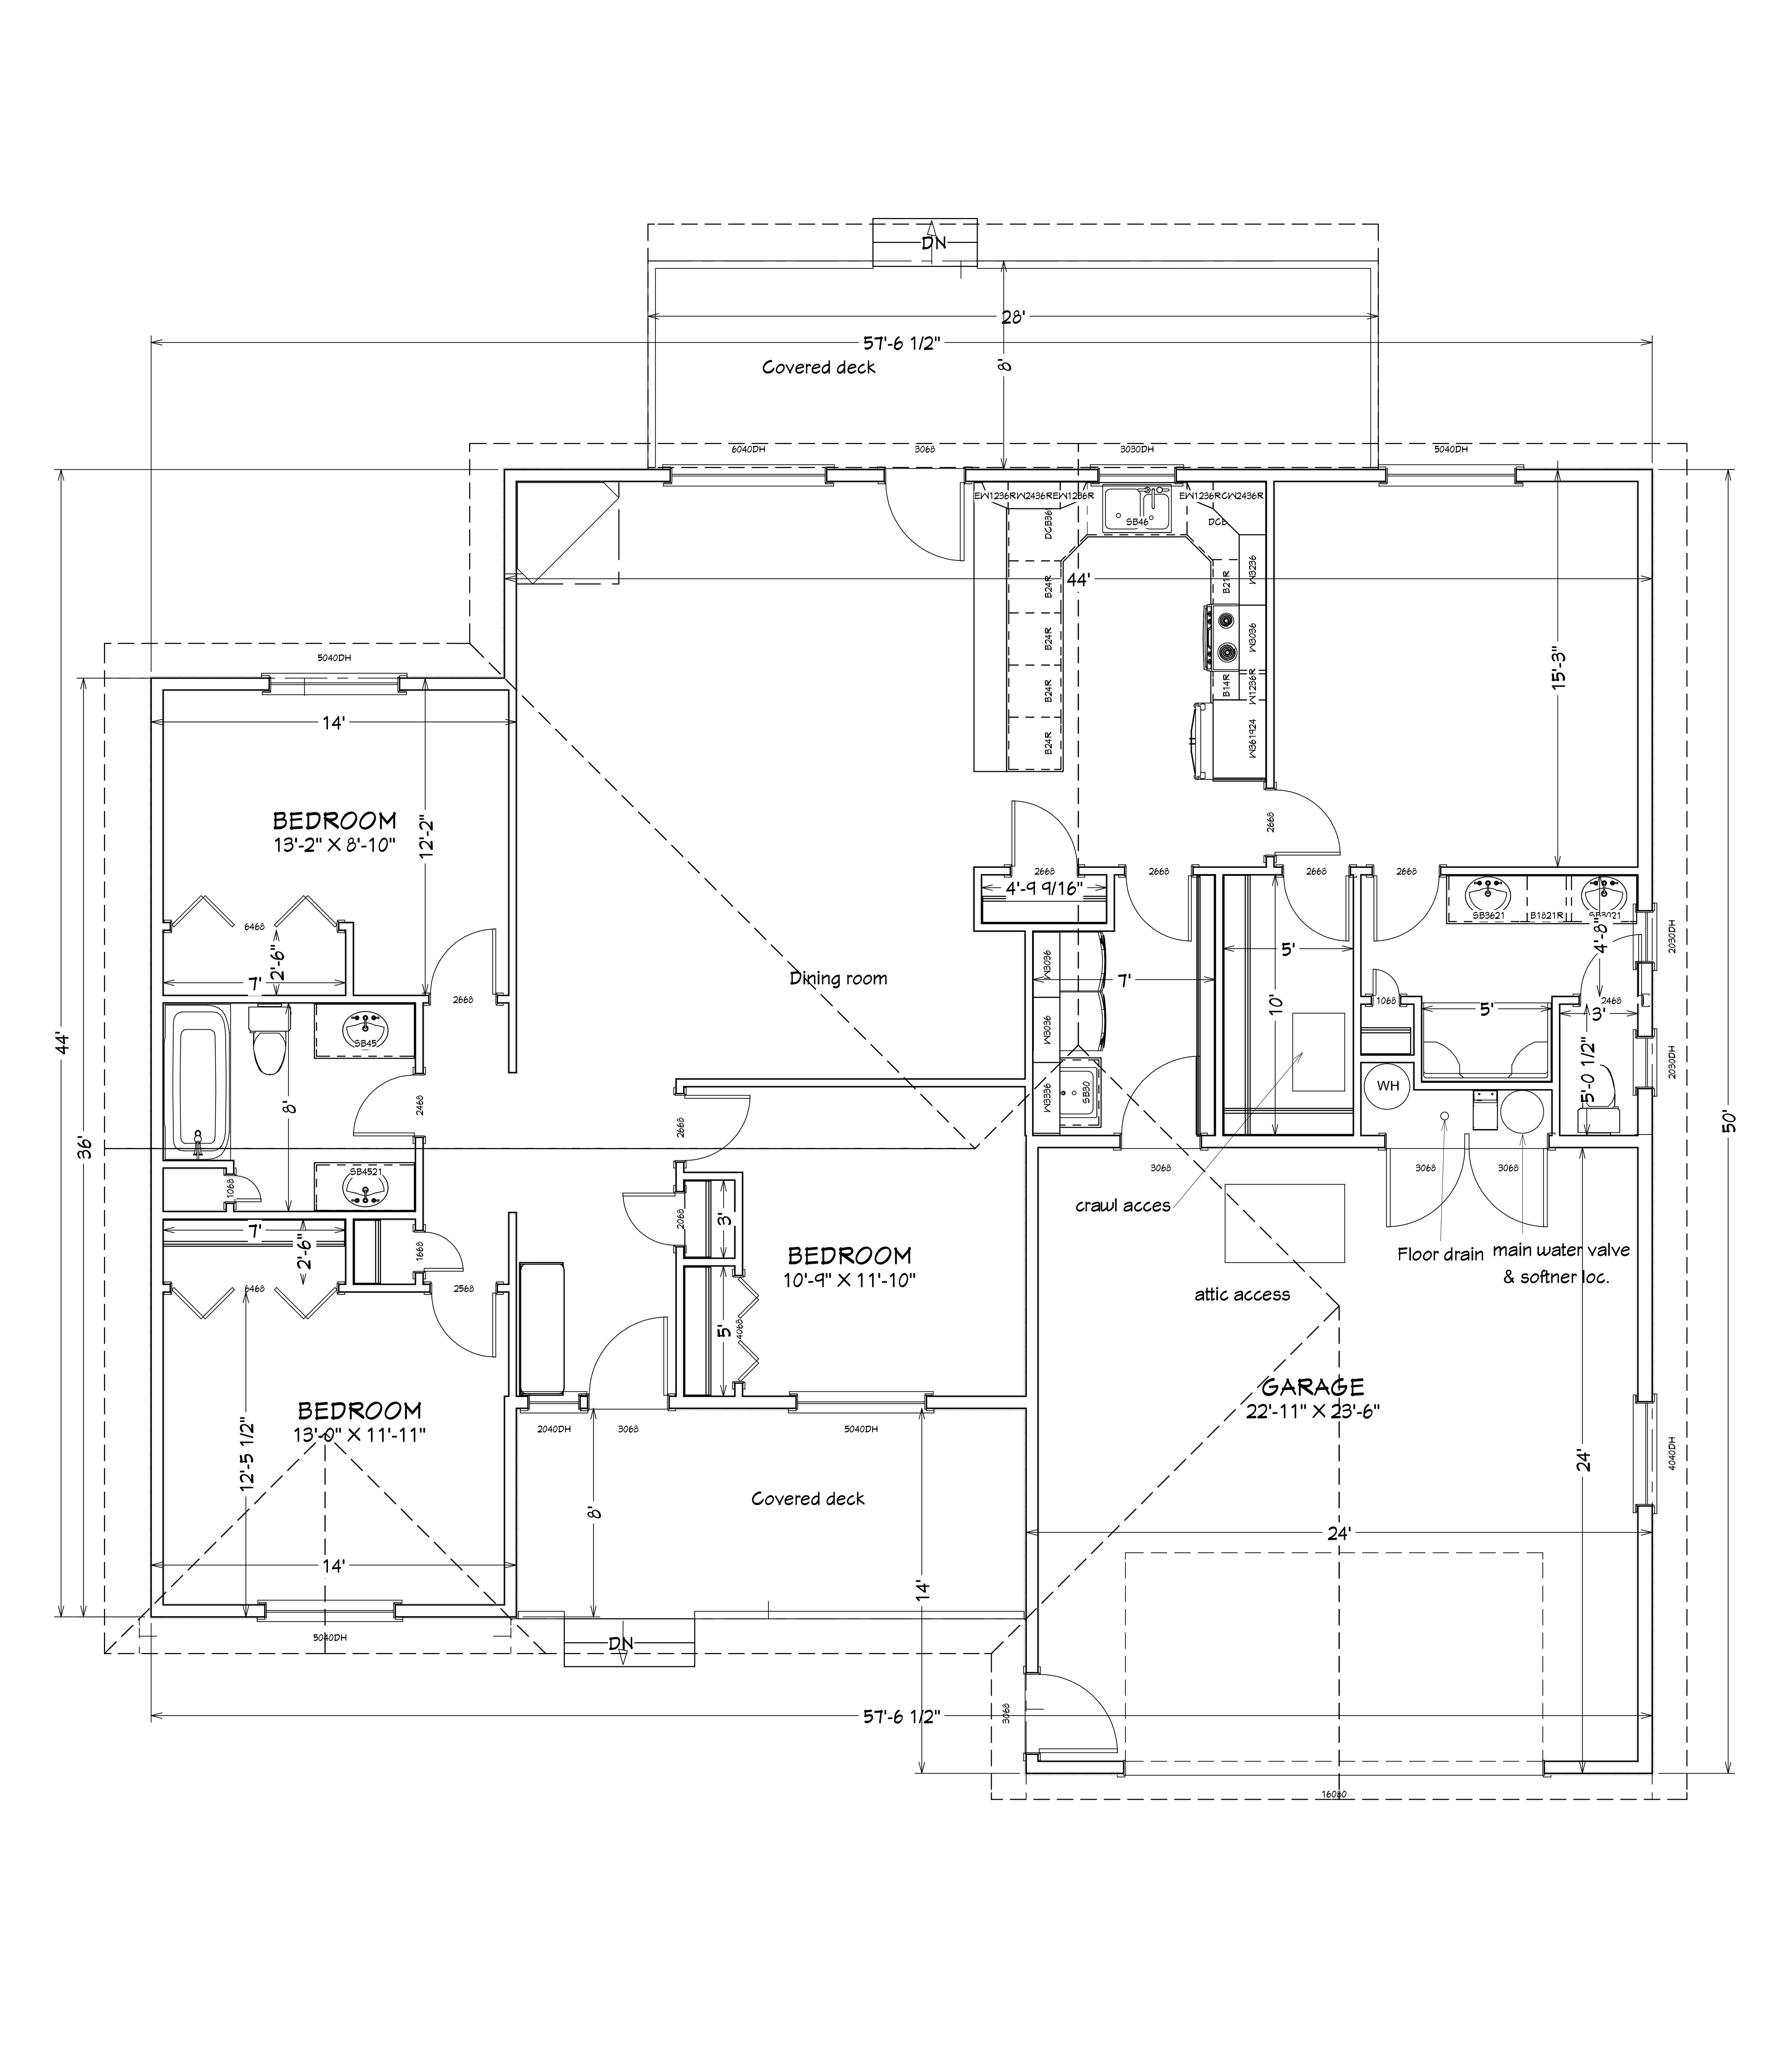 Emerald Estates layout template